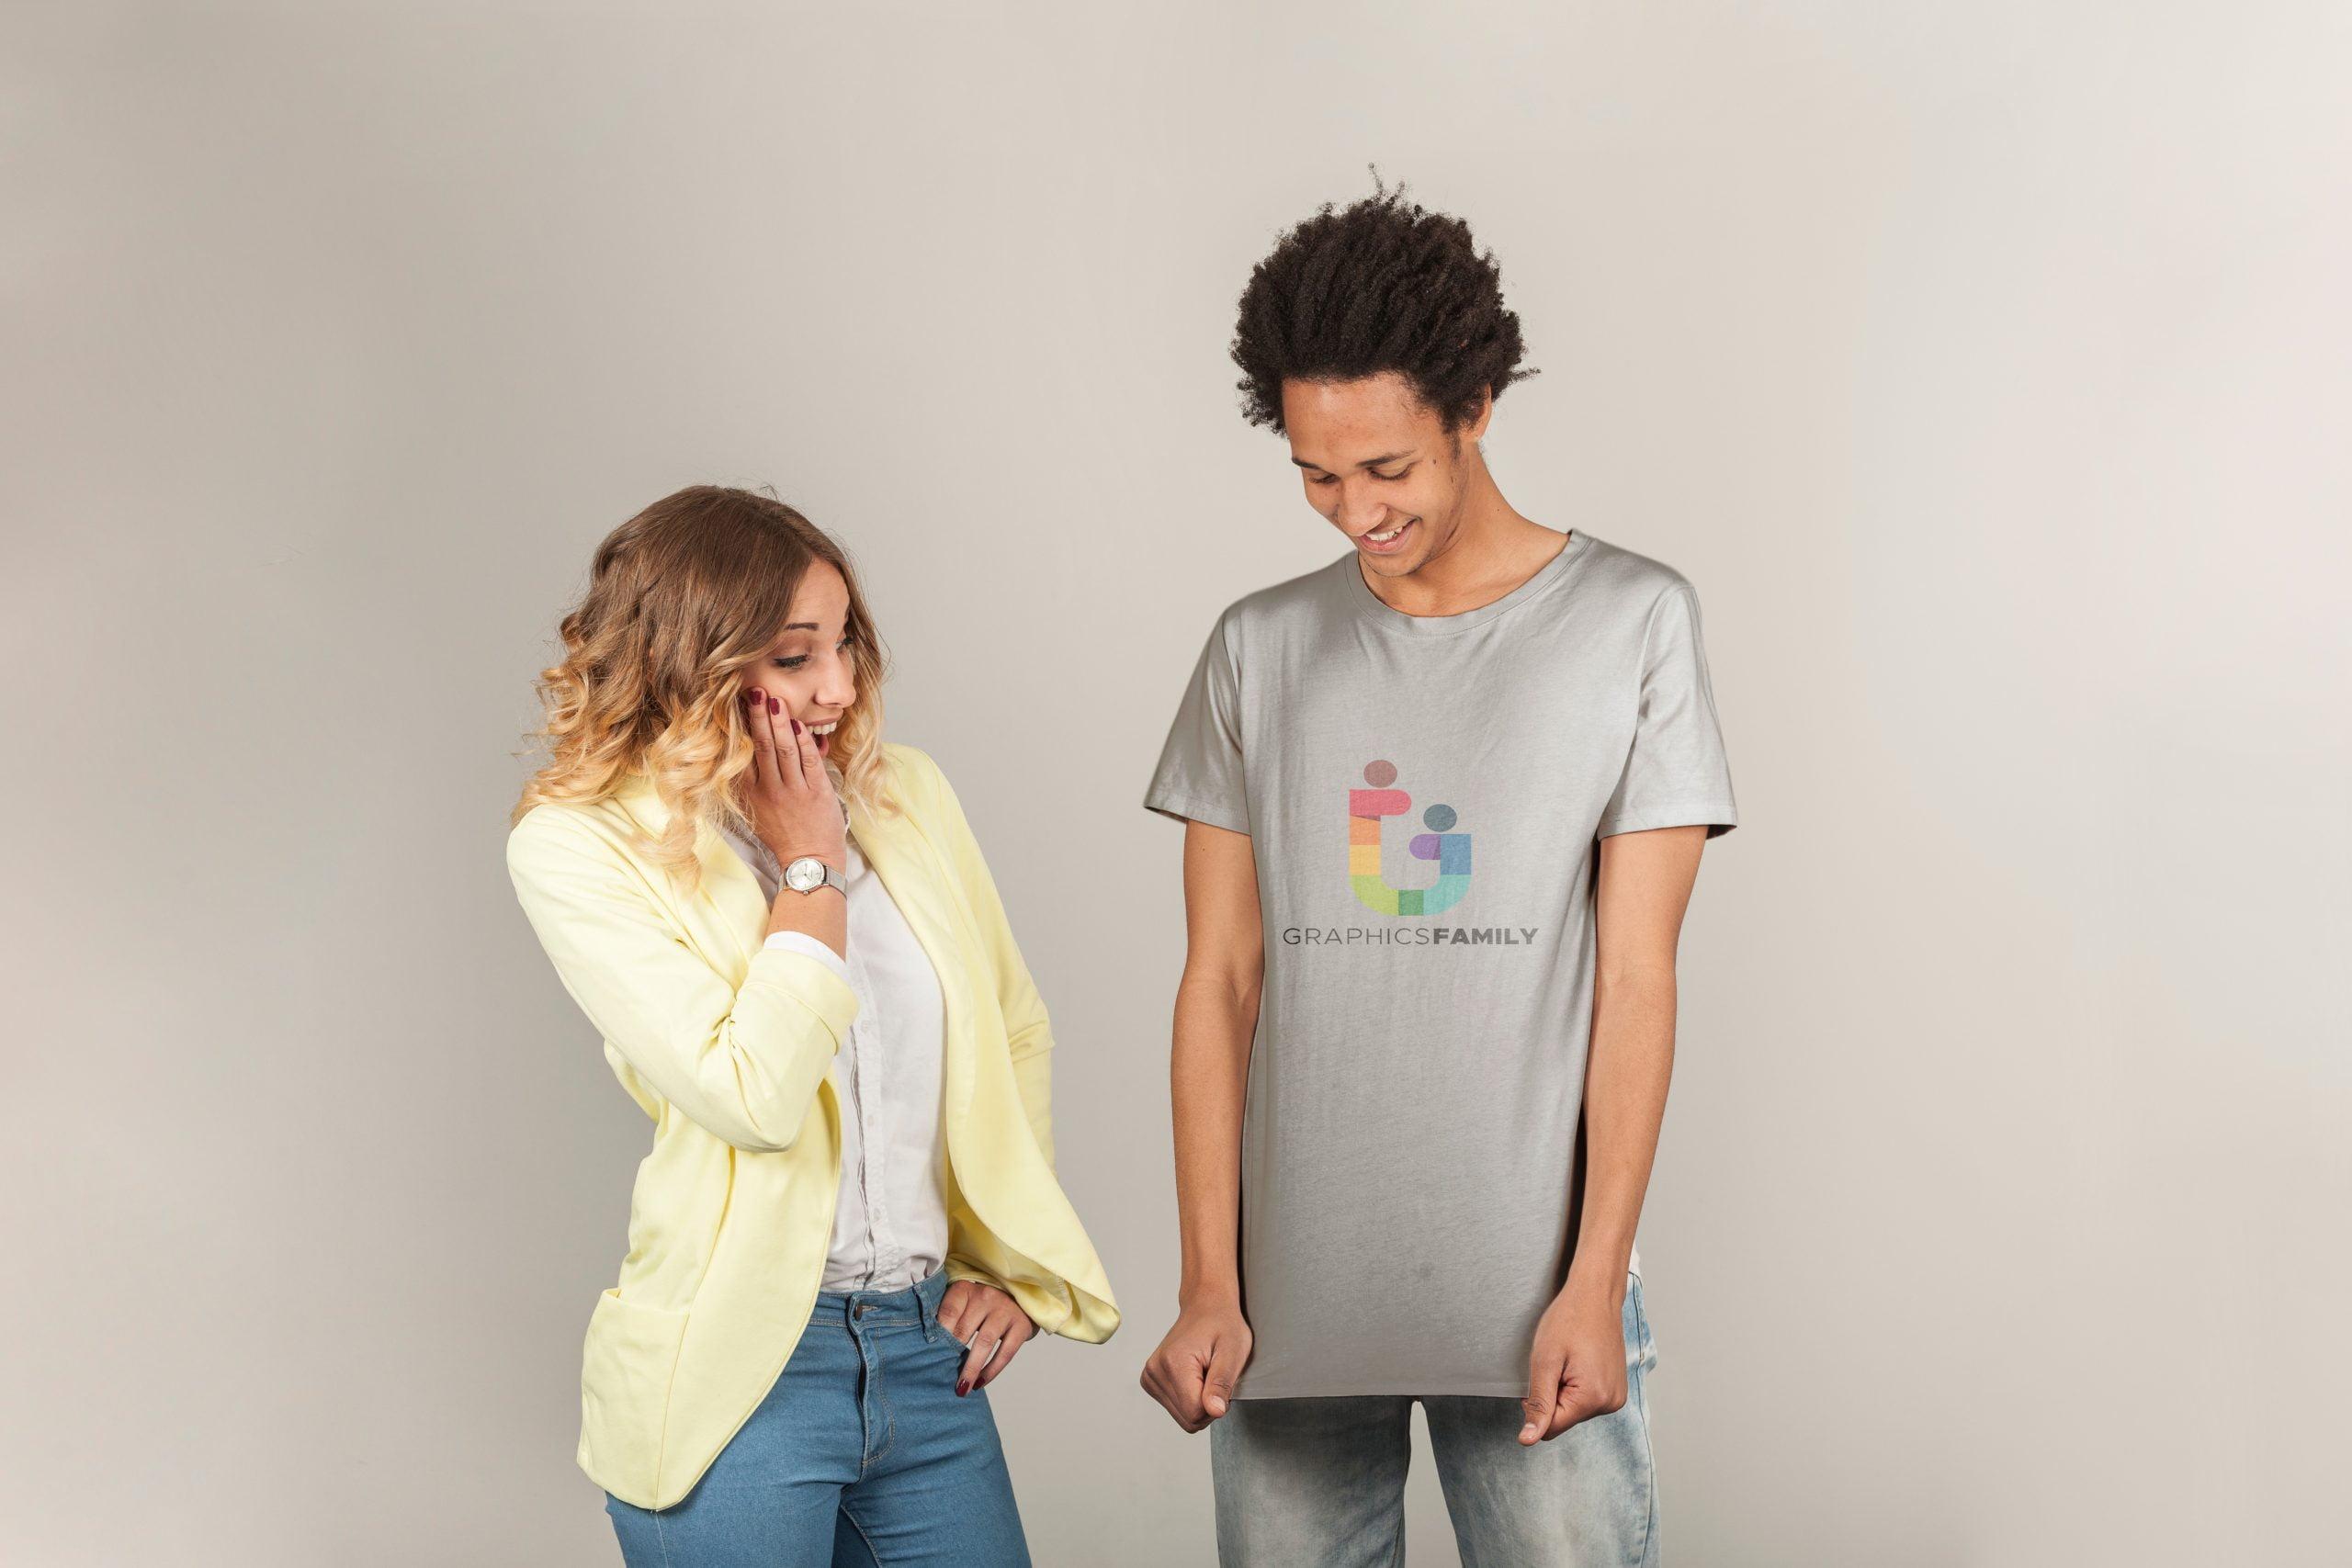 GraphicsFamily-Fashion-T-Shirt-Mockup